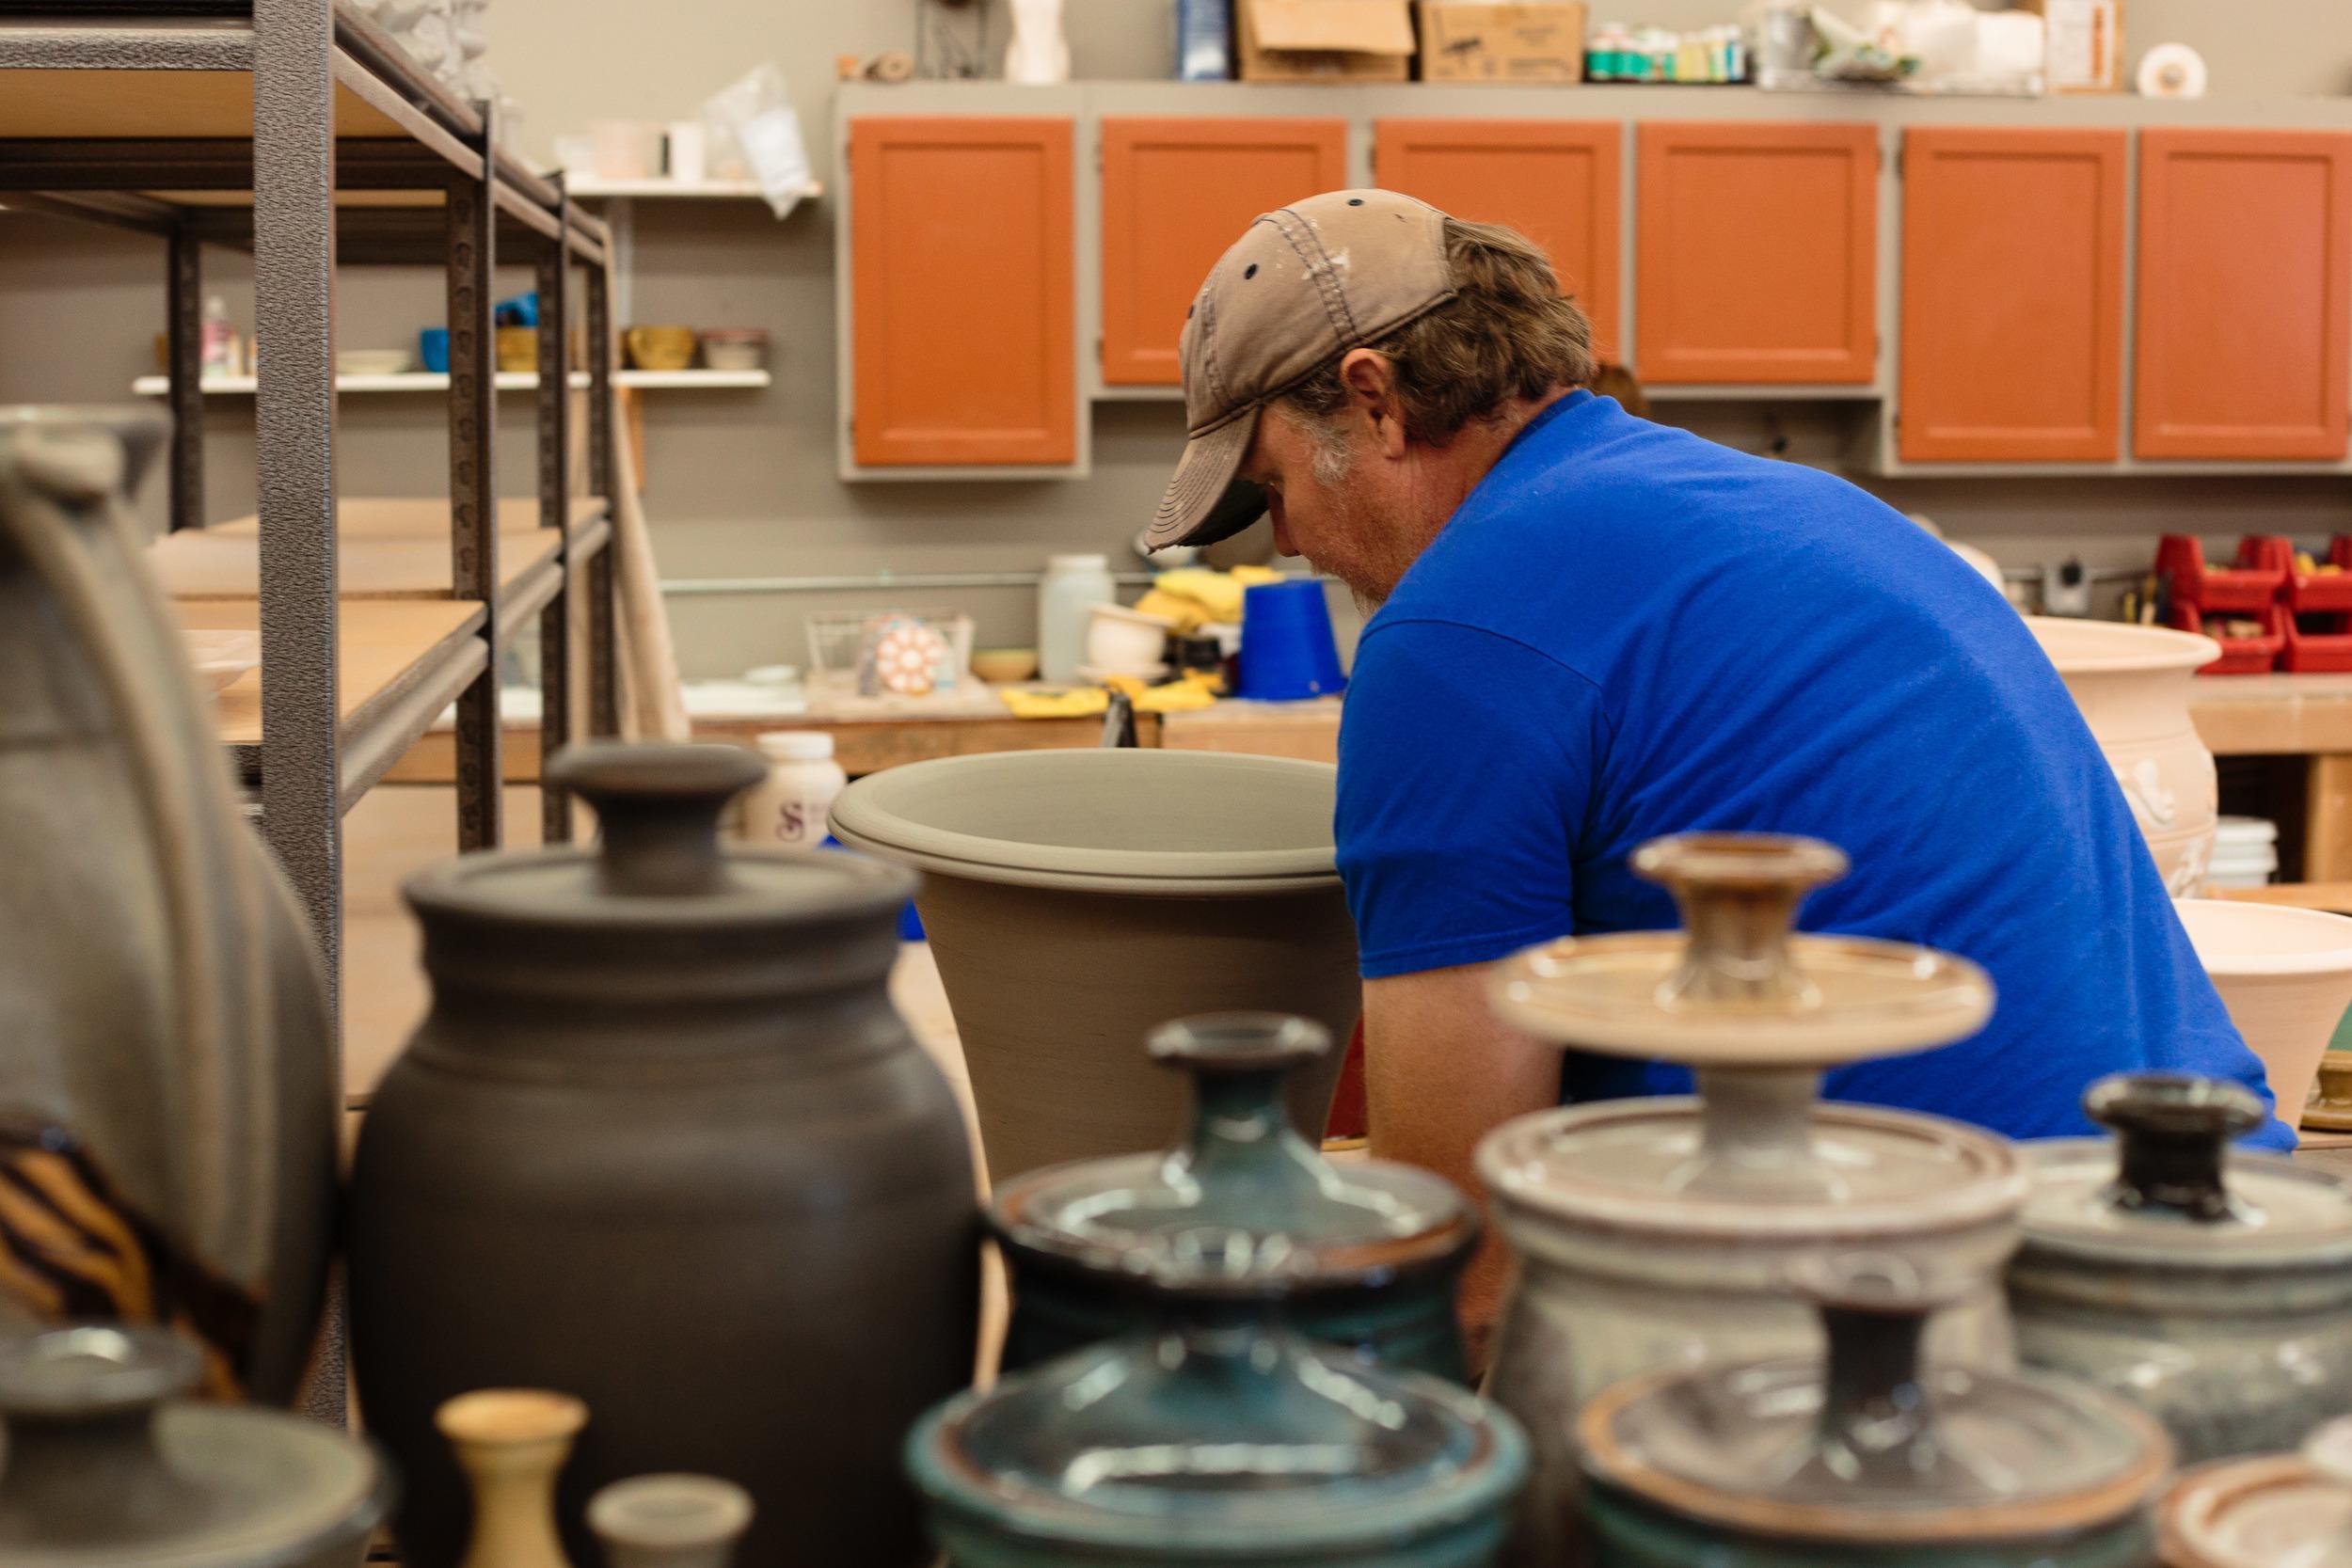 Potter working Pottery Studio St George UT